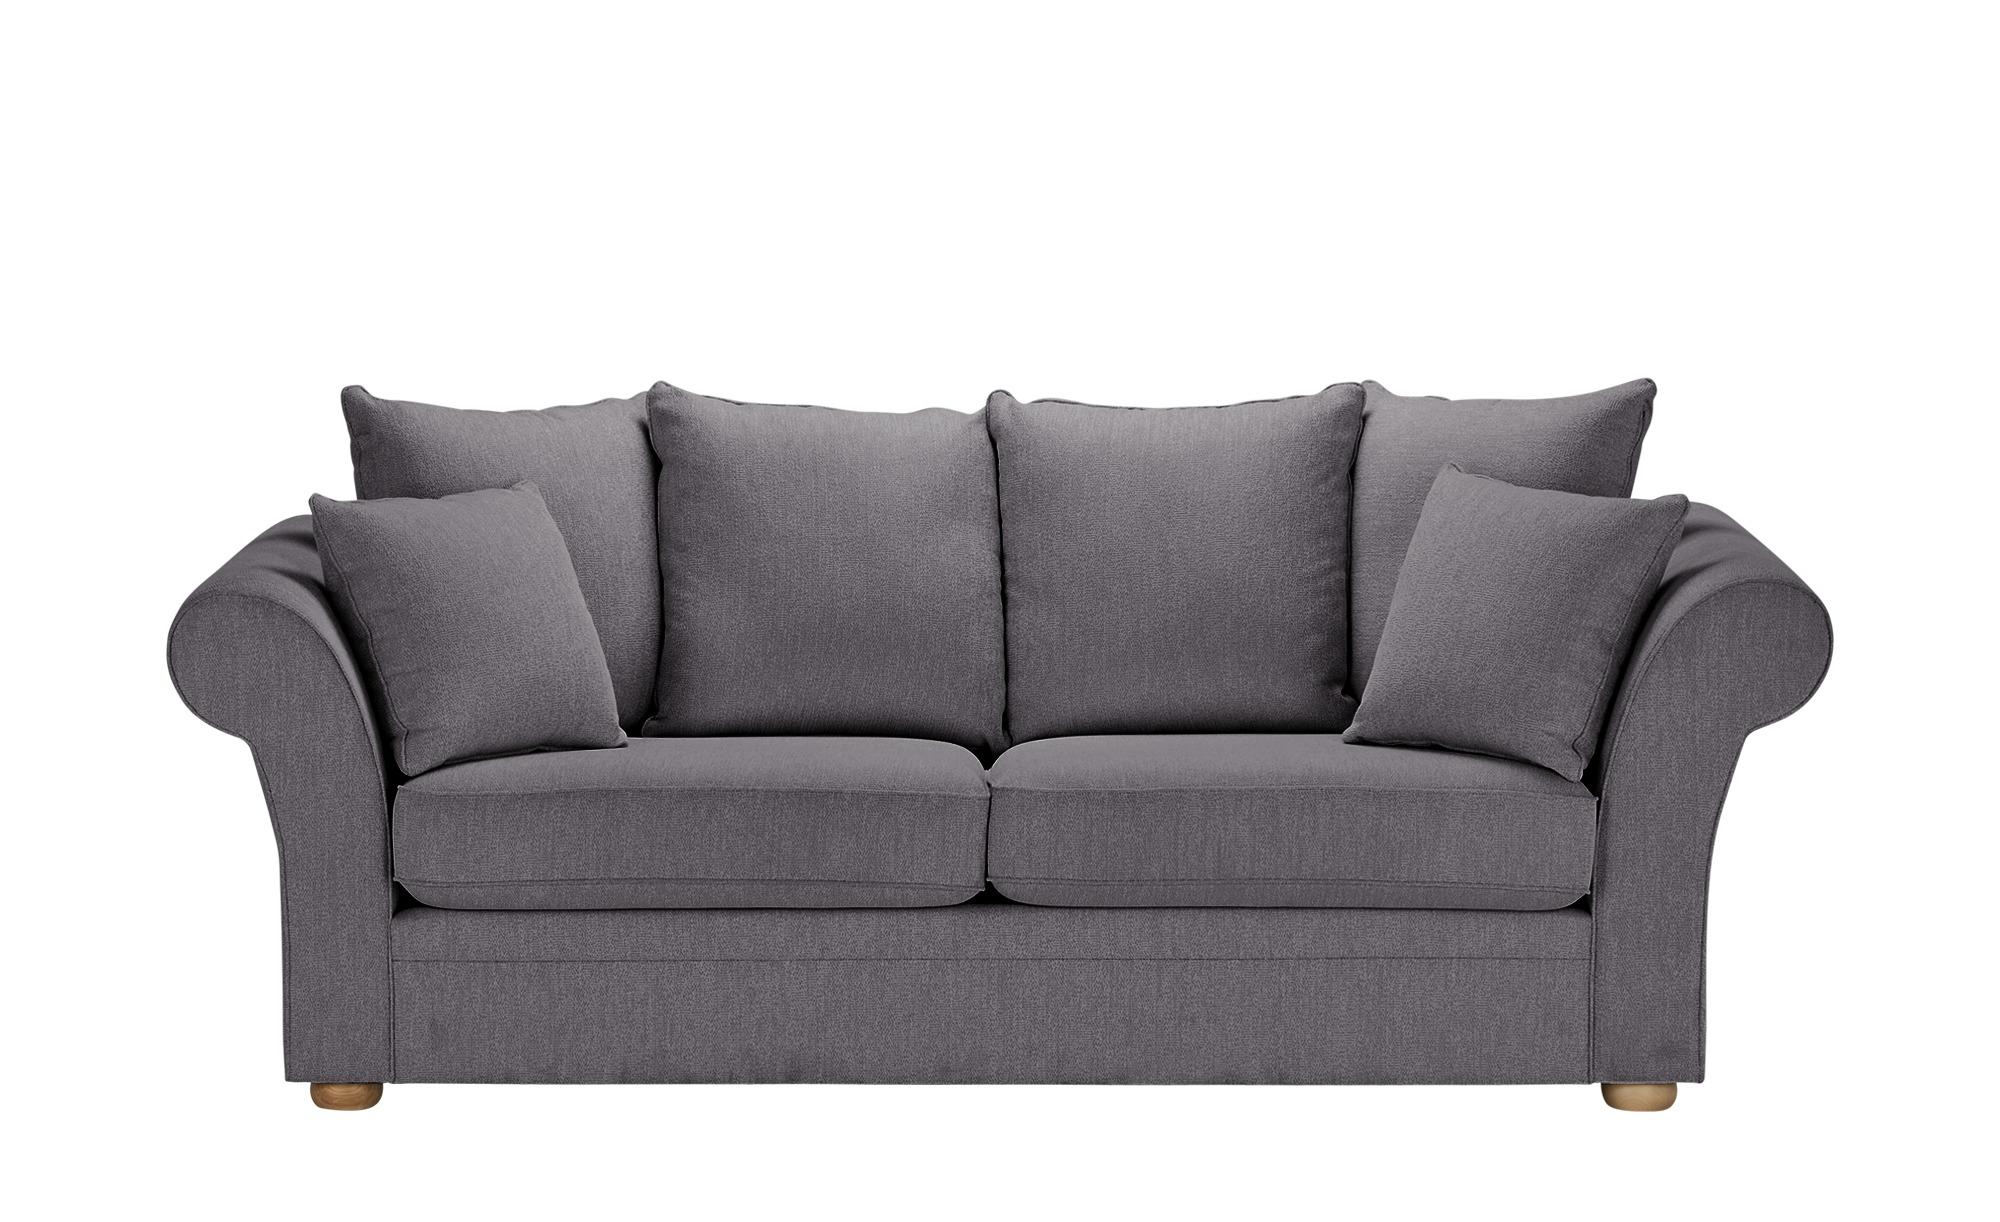 Sofa  Olivia ¦ grau ¦ Maße (cm): B: 240 H: 100 T: 98 Polstermöbel > Sofas > 3-Sitzer - Höffner